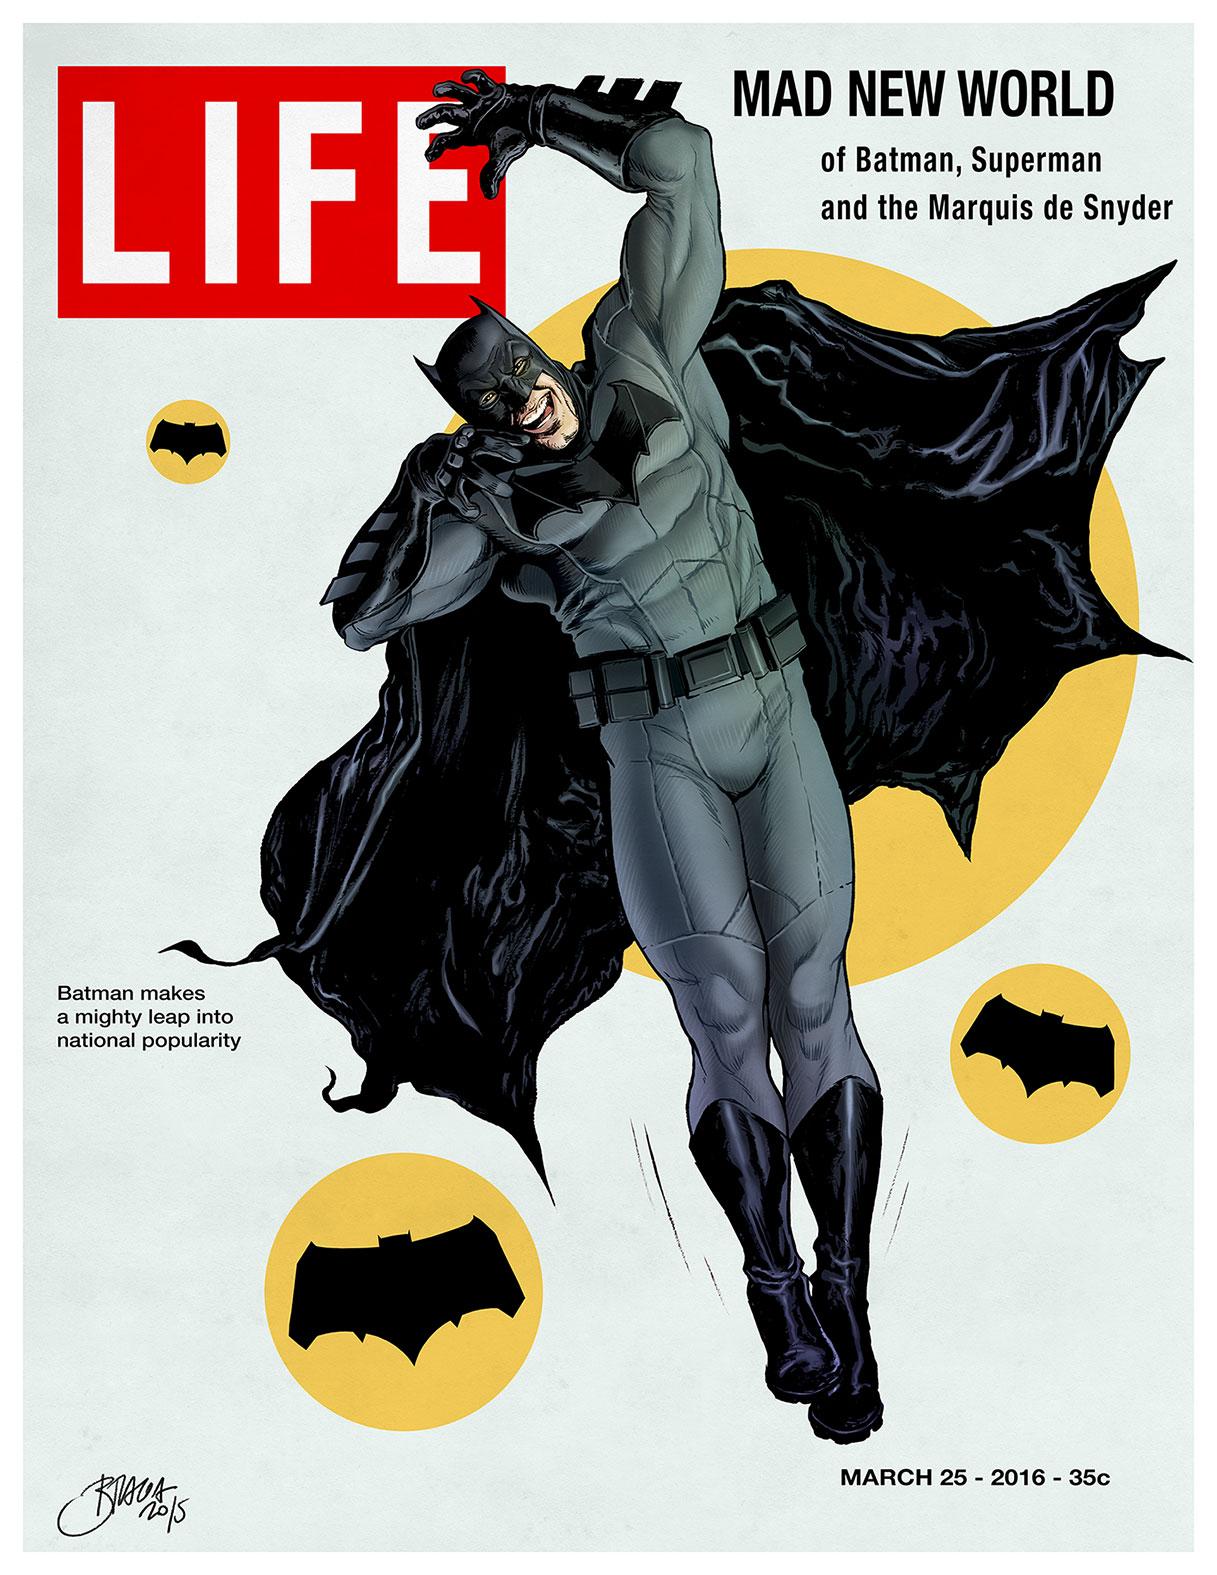 batman-diburros-affleck-life-magazine-braga-diburros